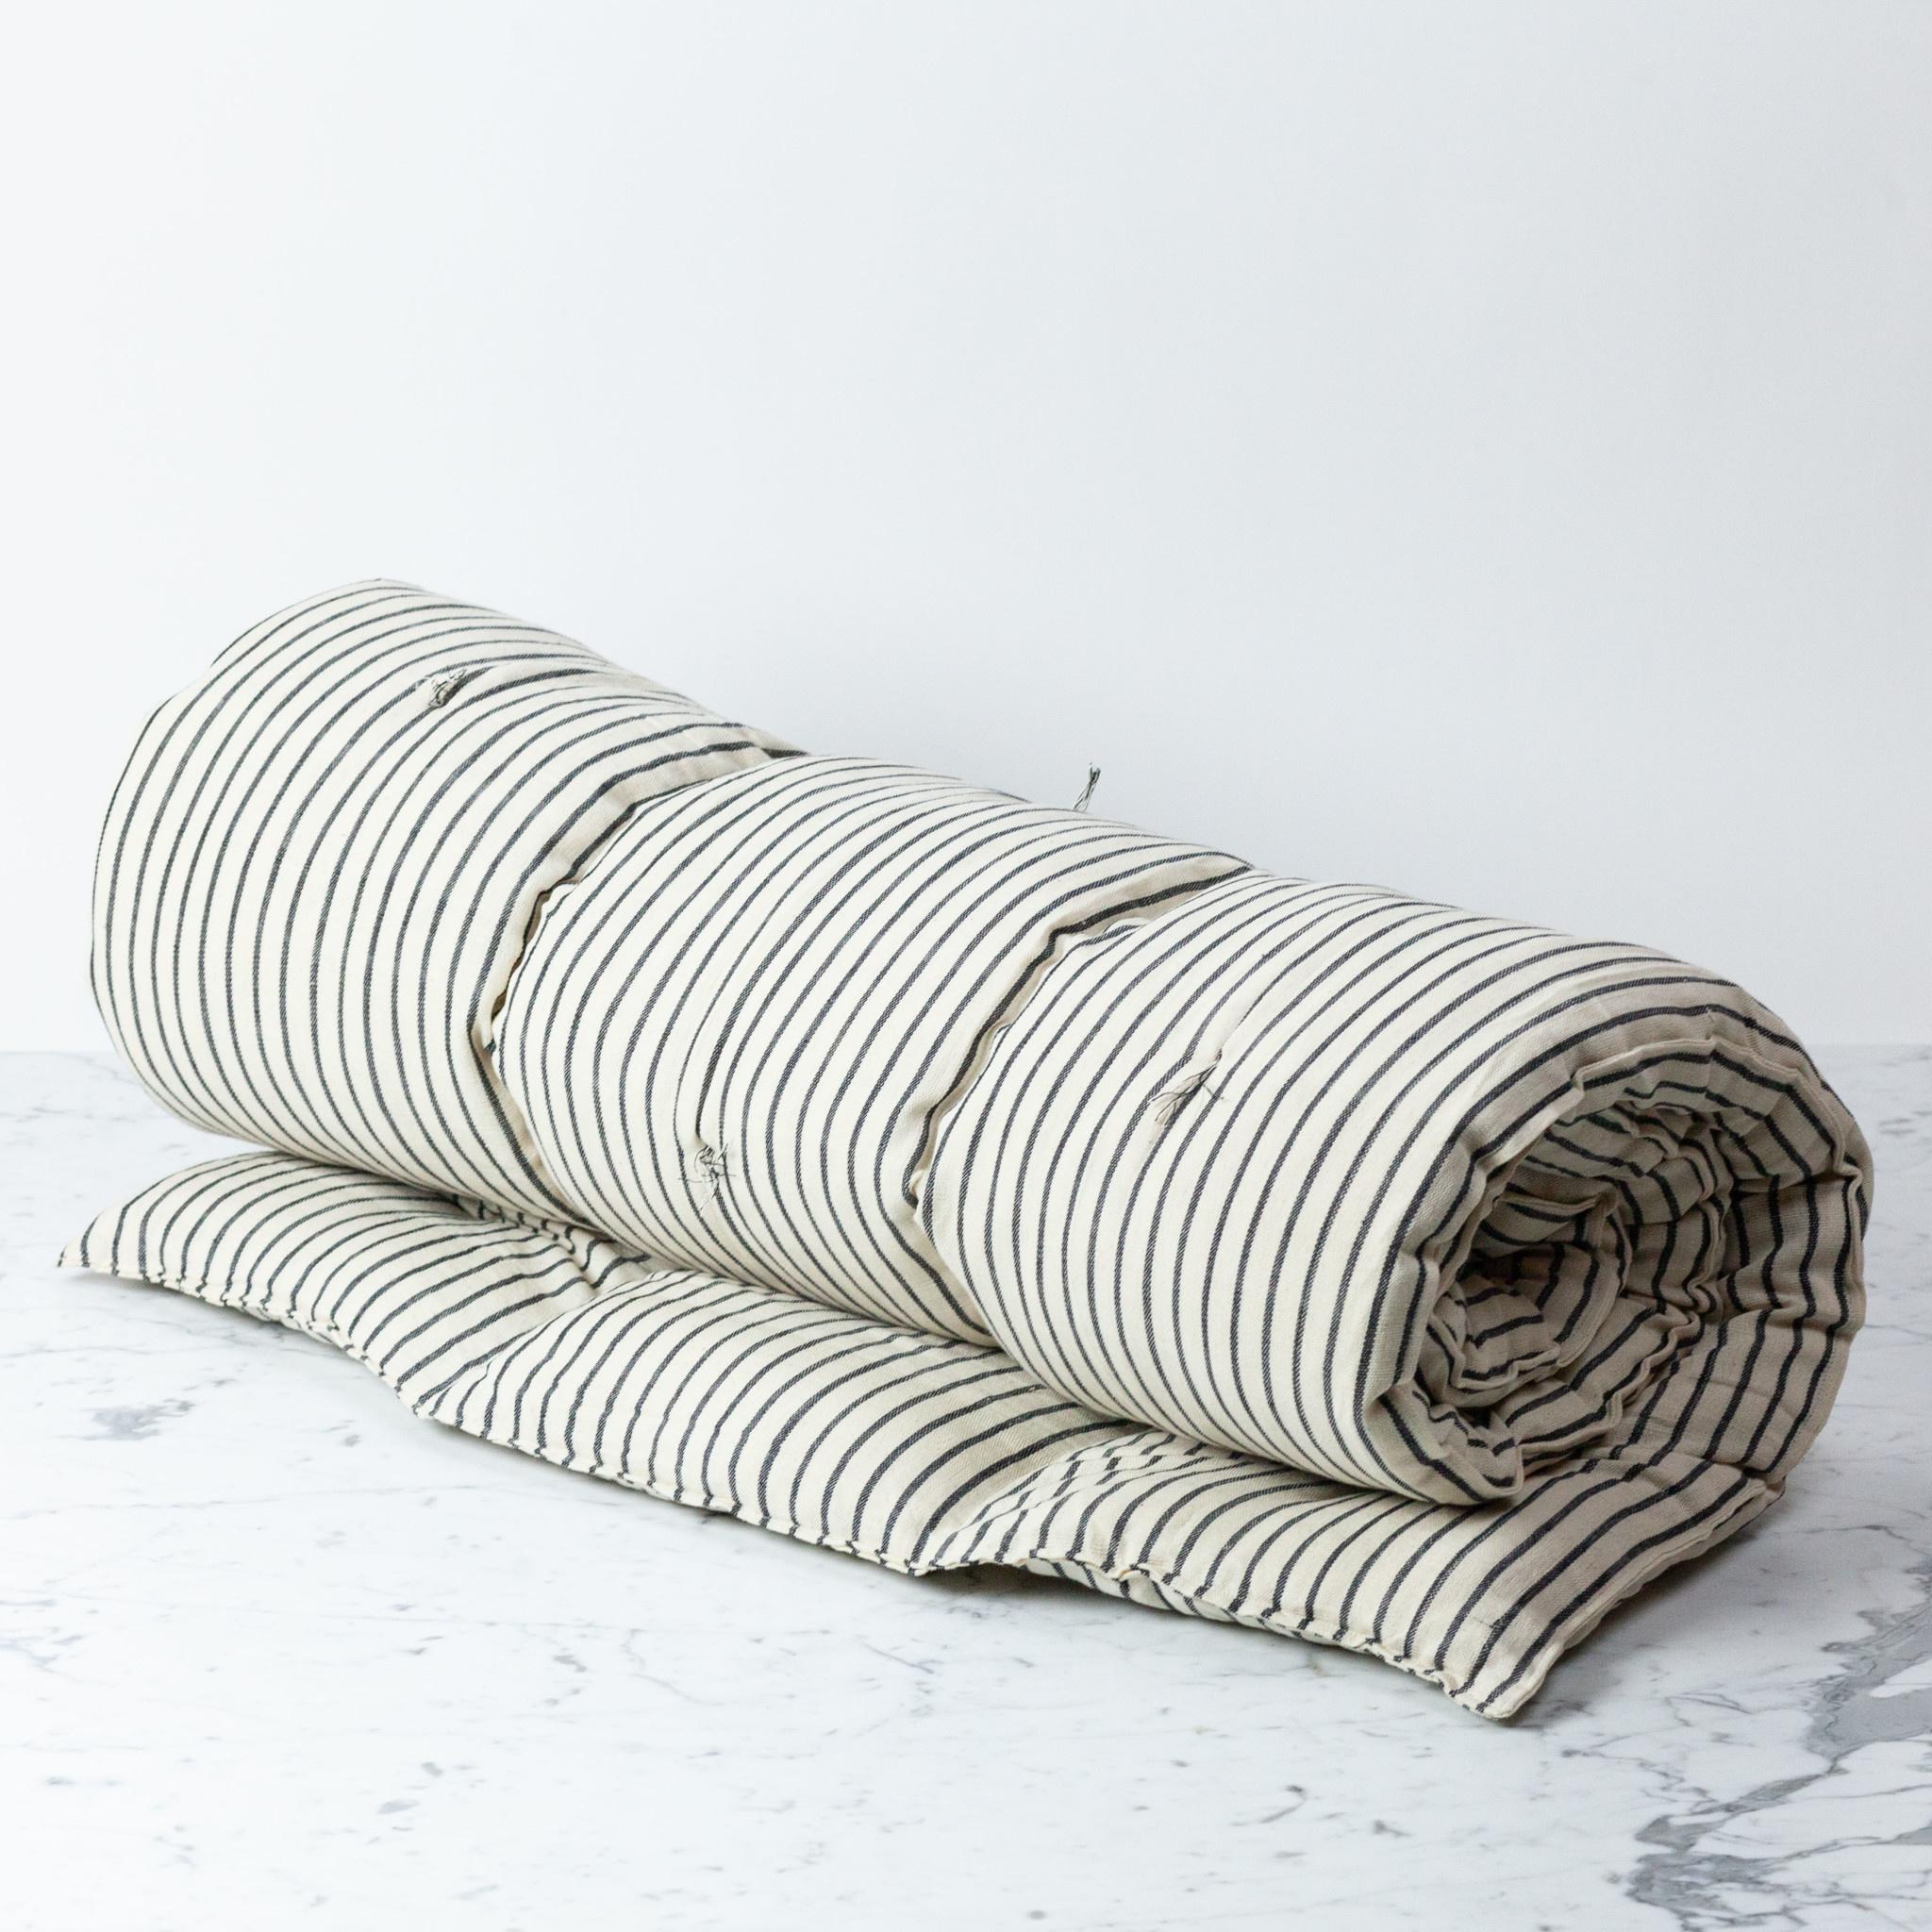 TENSIRA Handwoven Cotton Cot Mattress with Kapok Filling - Off White with Slim Regular Black Stripe - 30 x 80 inch